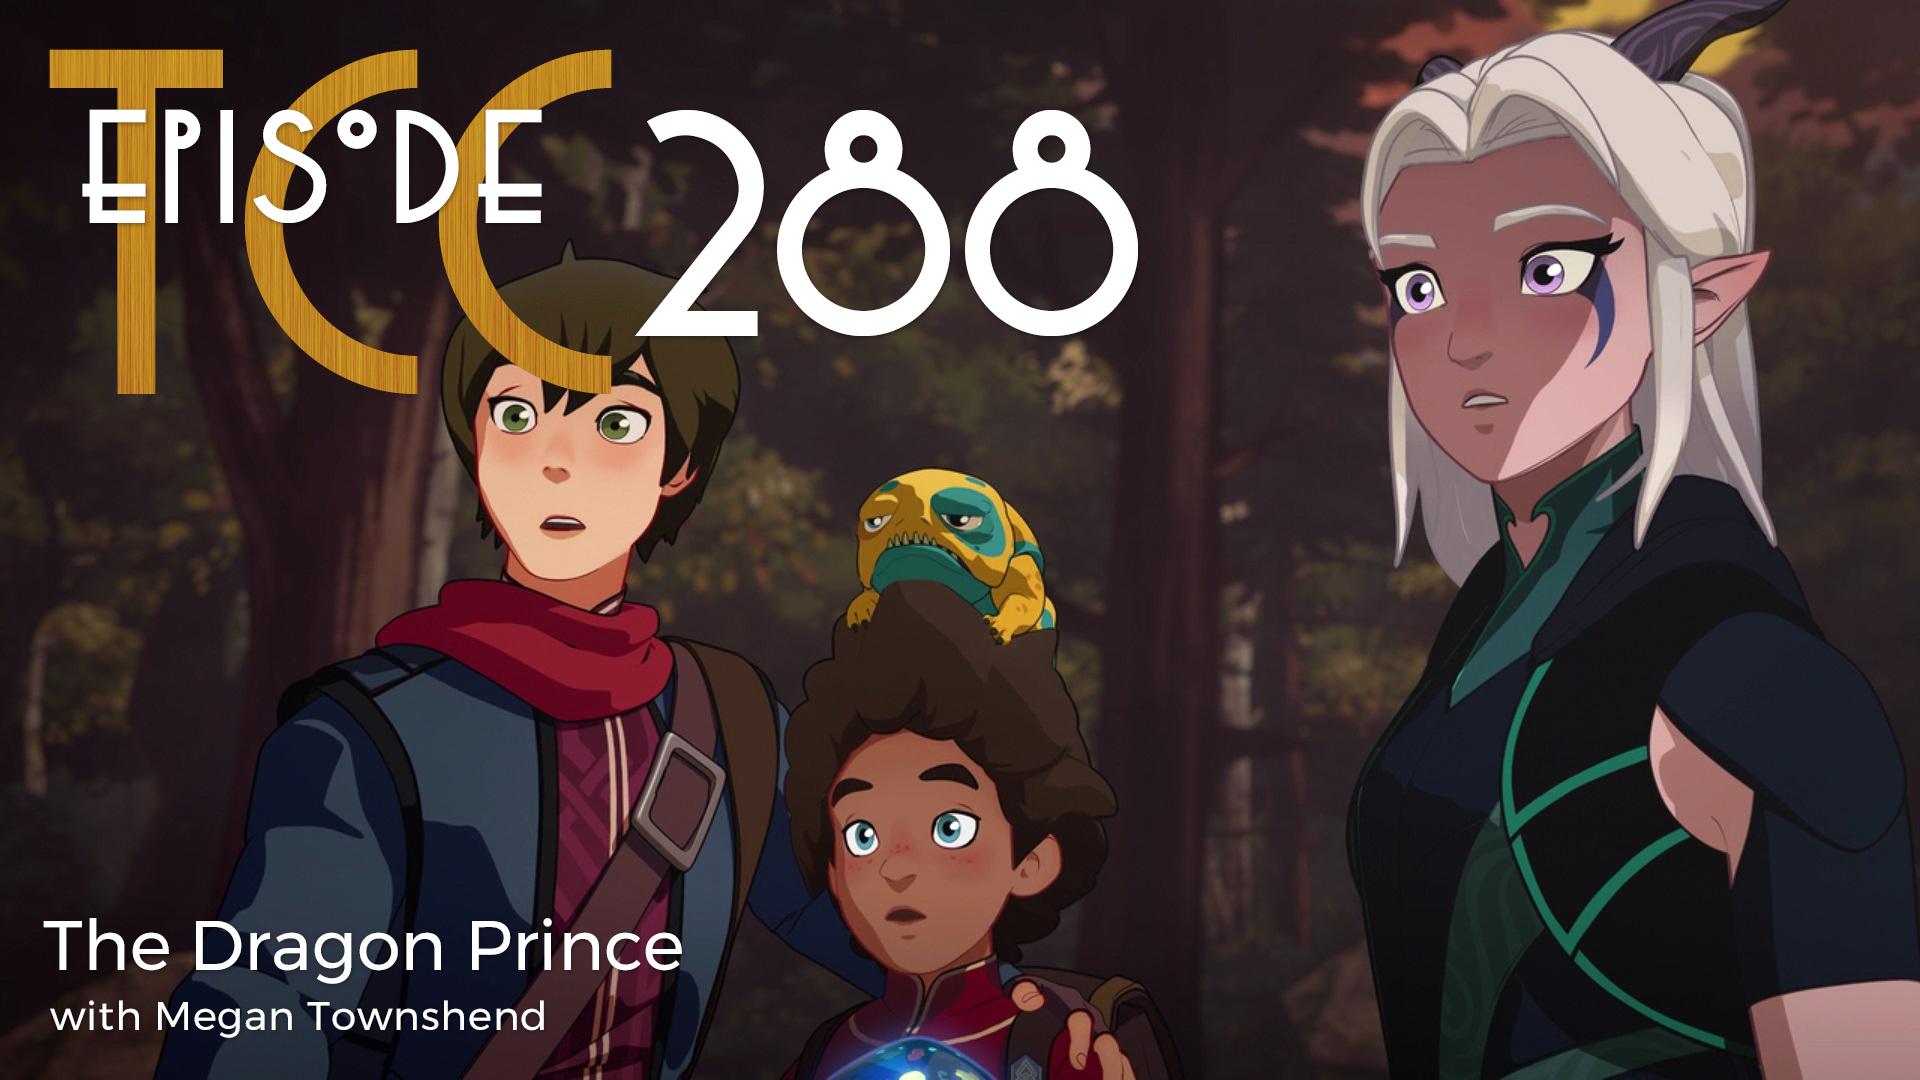 The Citadel Cafe 288: The Dragon Prince